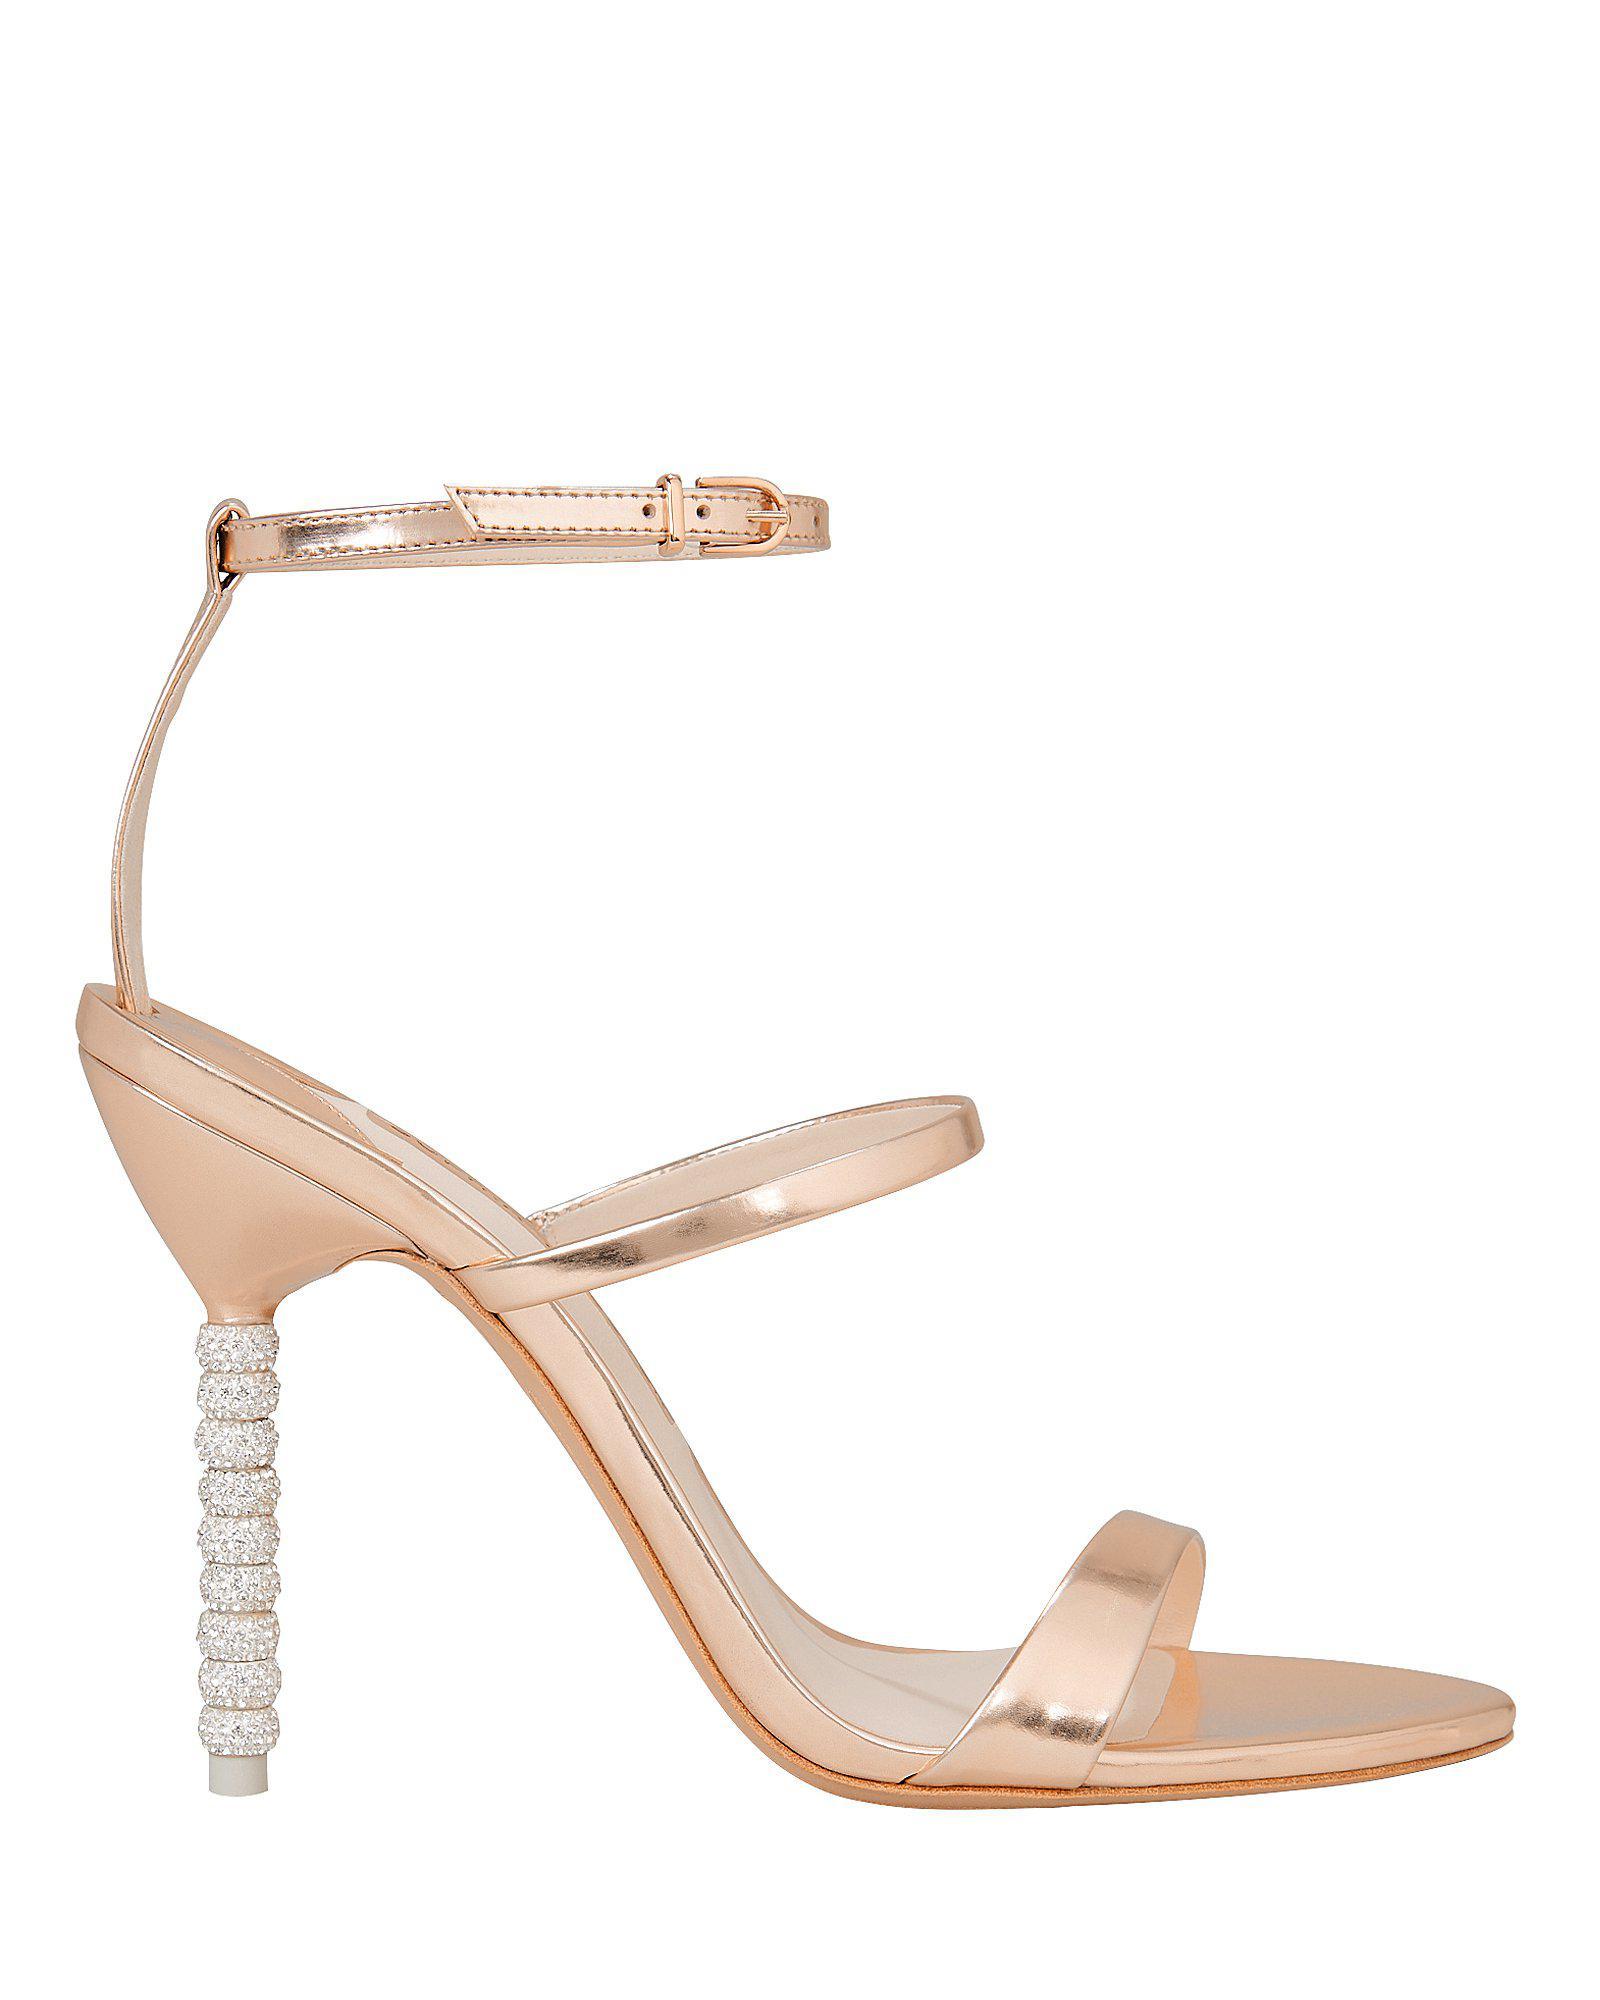 91c4aef8b Lyst - Sophia Webster Rosalind Rose Gold Crystal Heel Sandals in ...